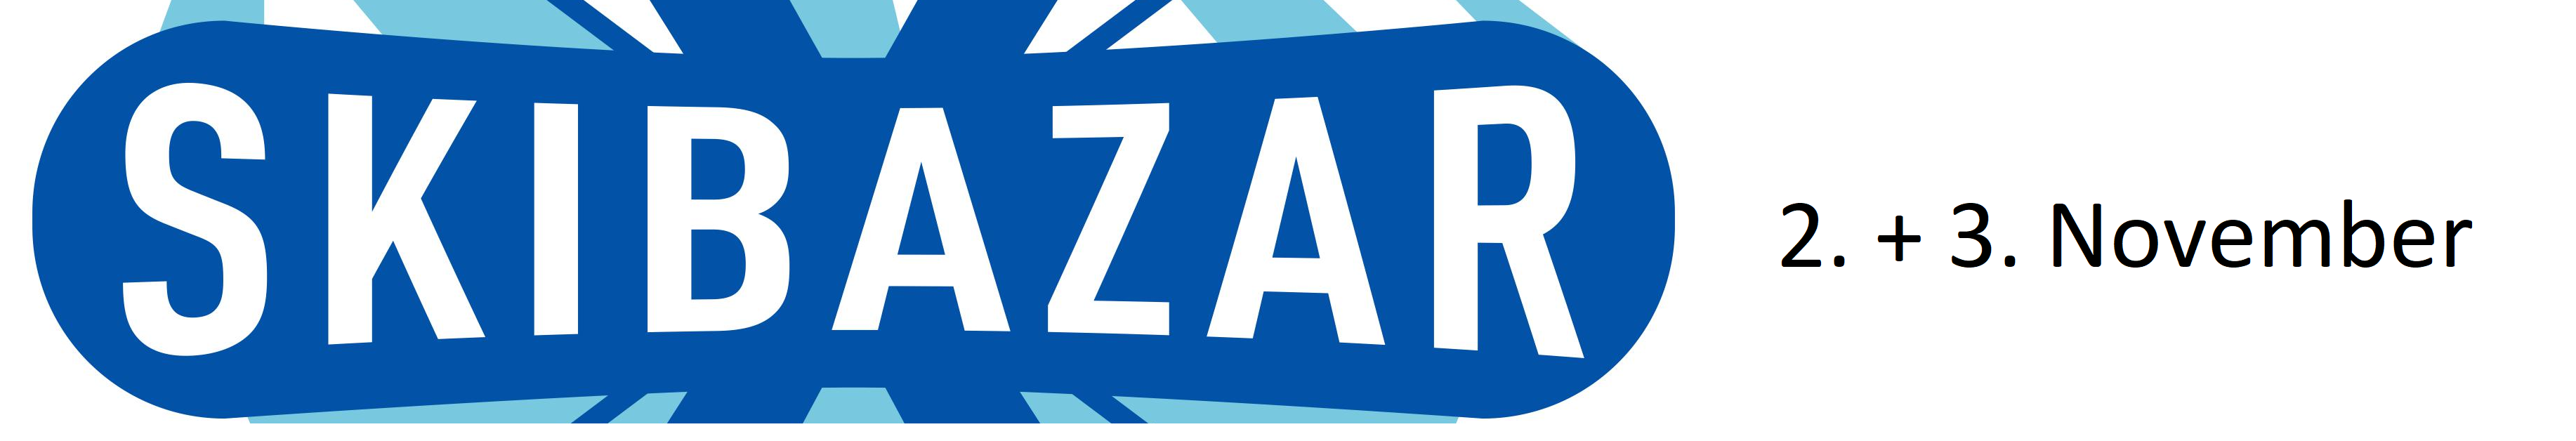 Skibazar 2018